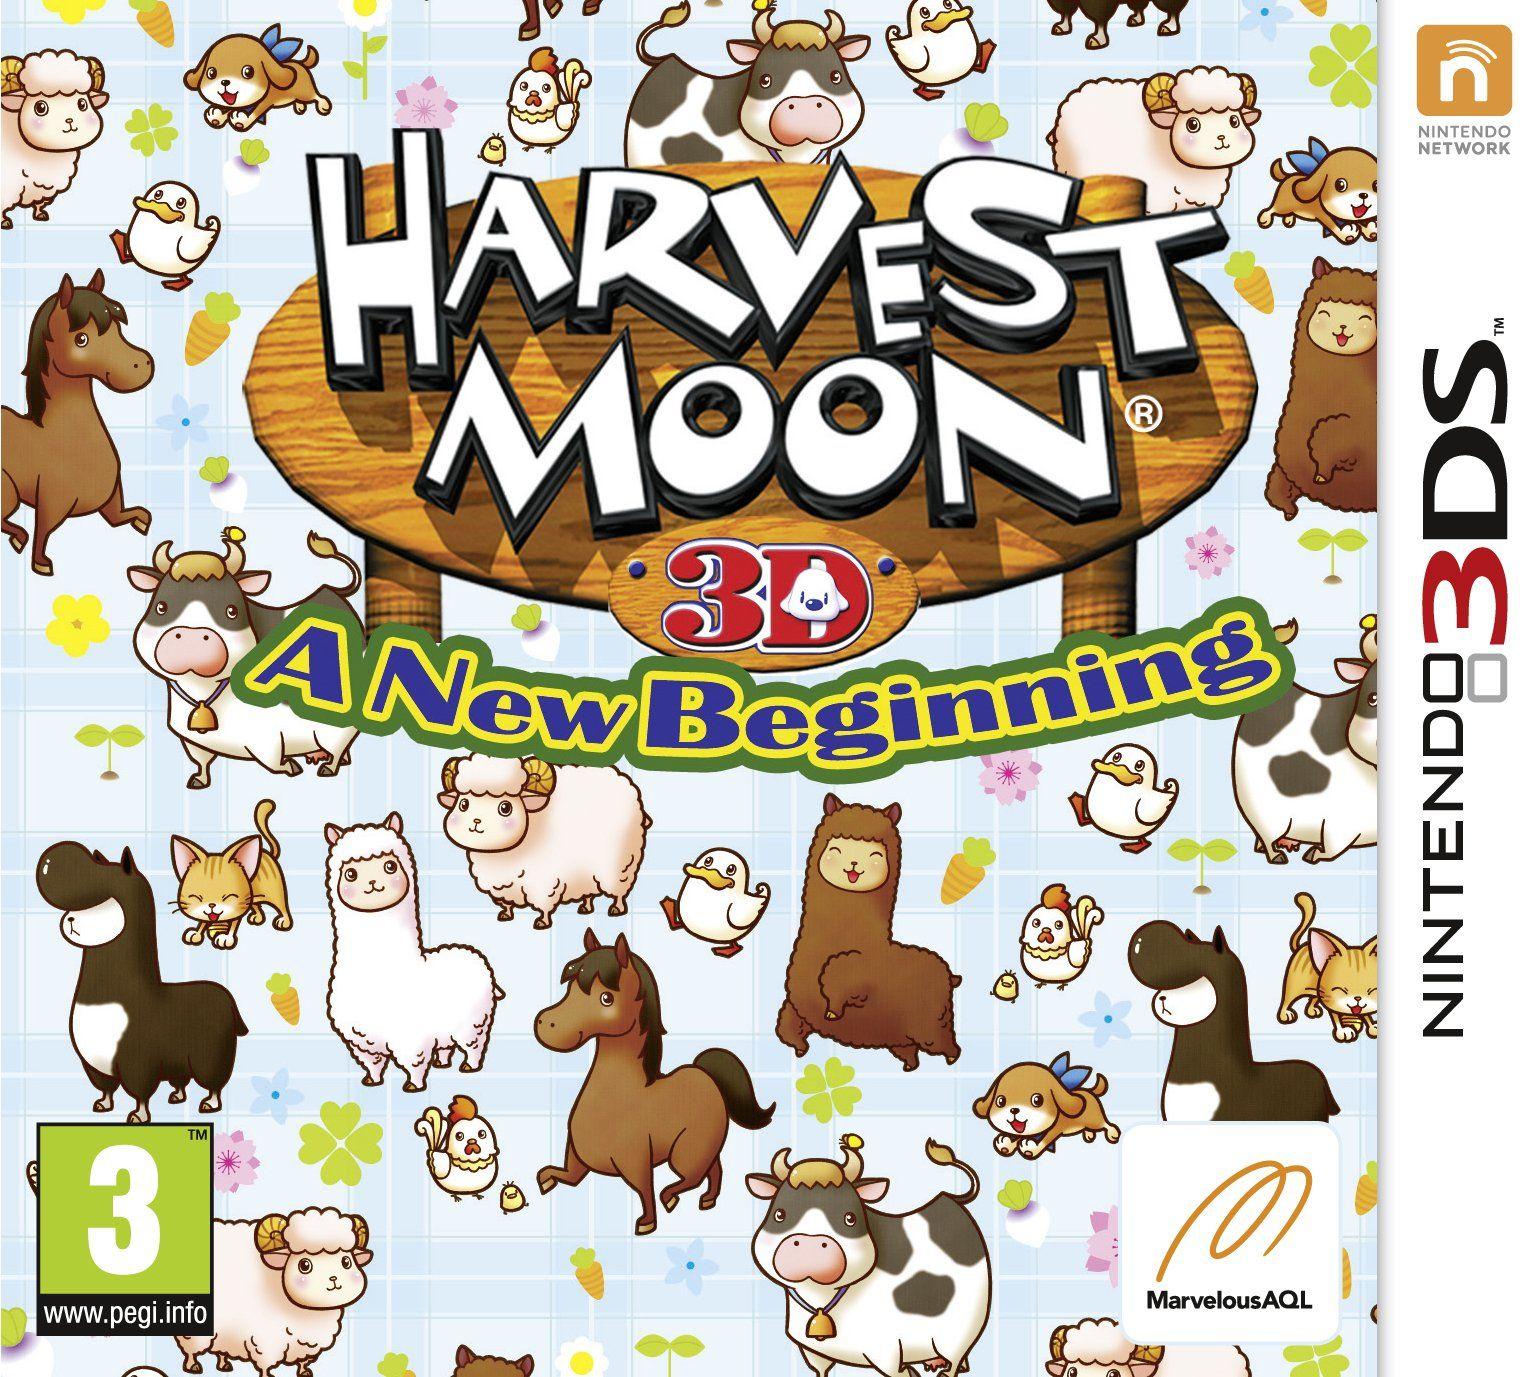 Harvest Moon A New Beginning (Nintendo 3DS) Amazon.co.uk